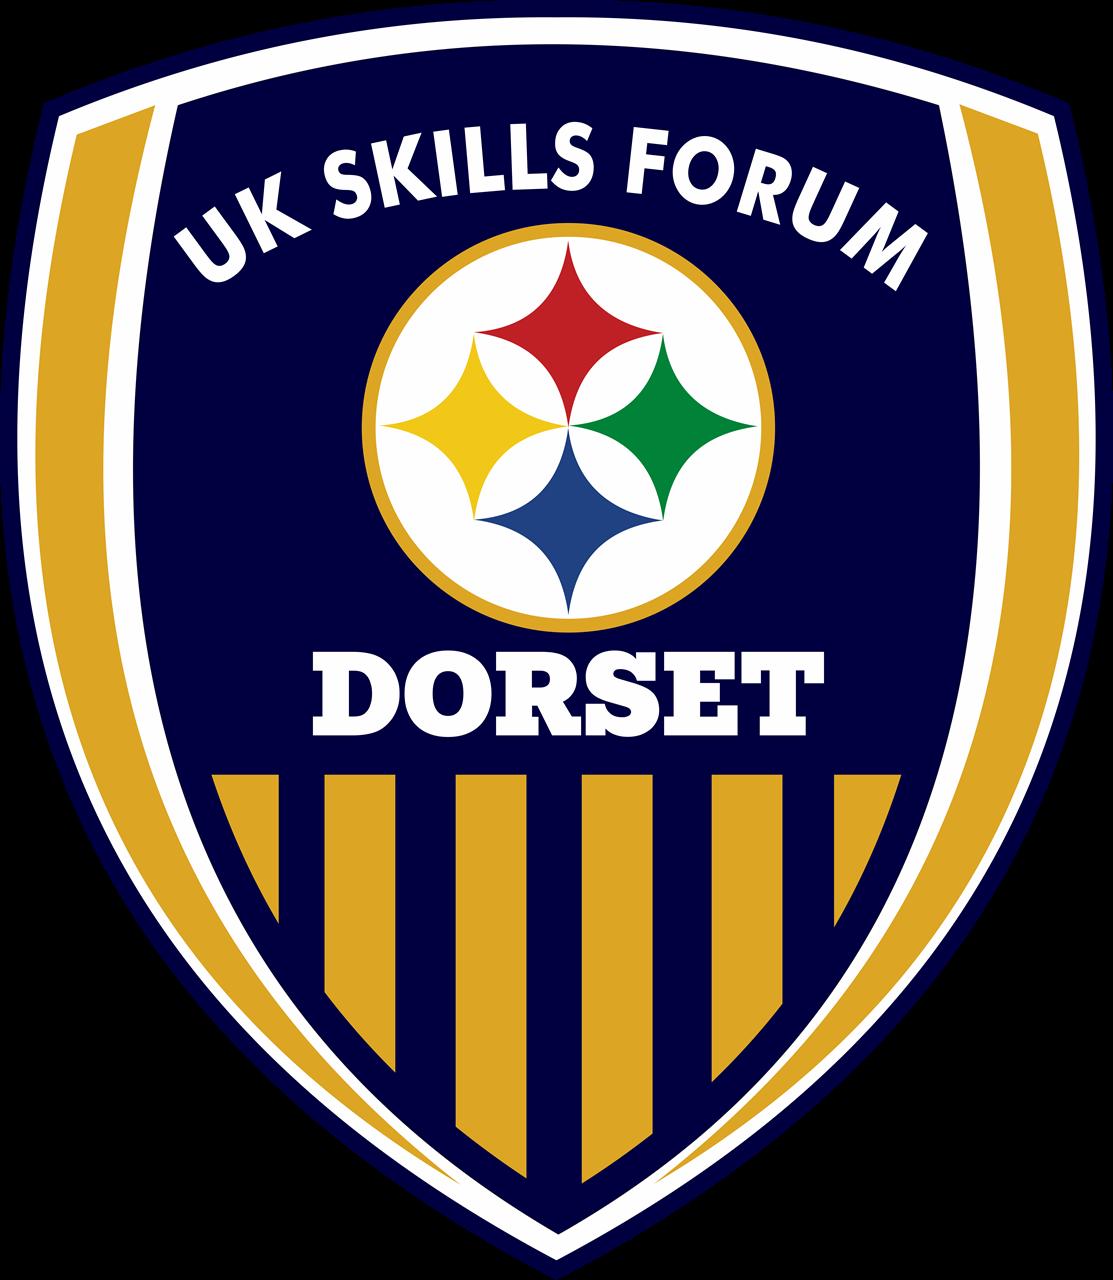 Club Image for UK Skills Forum